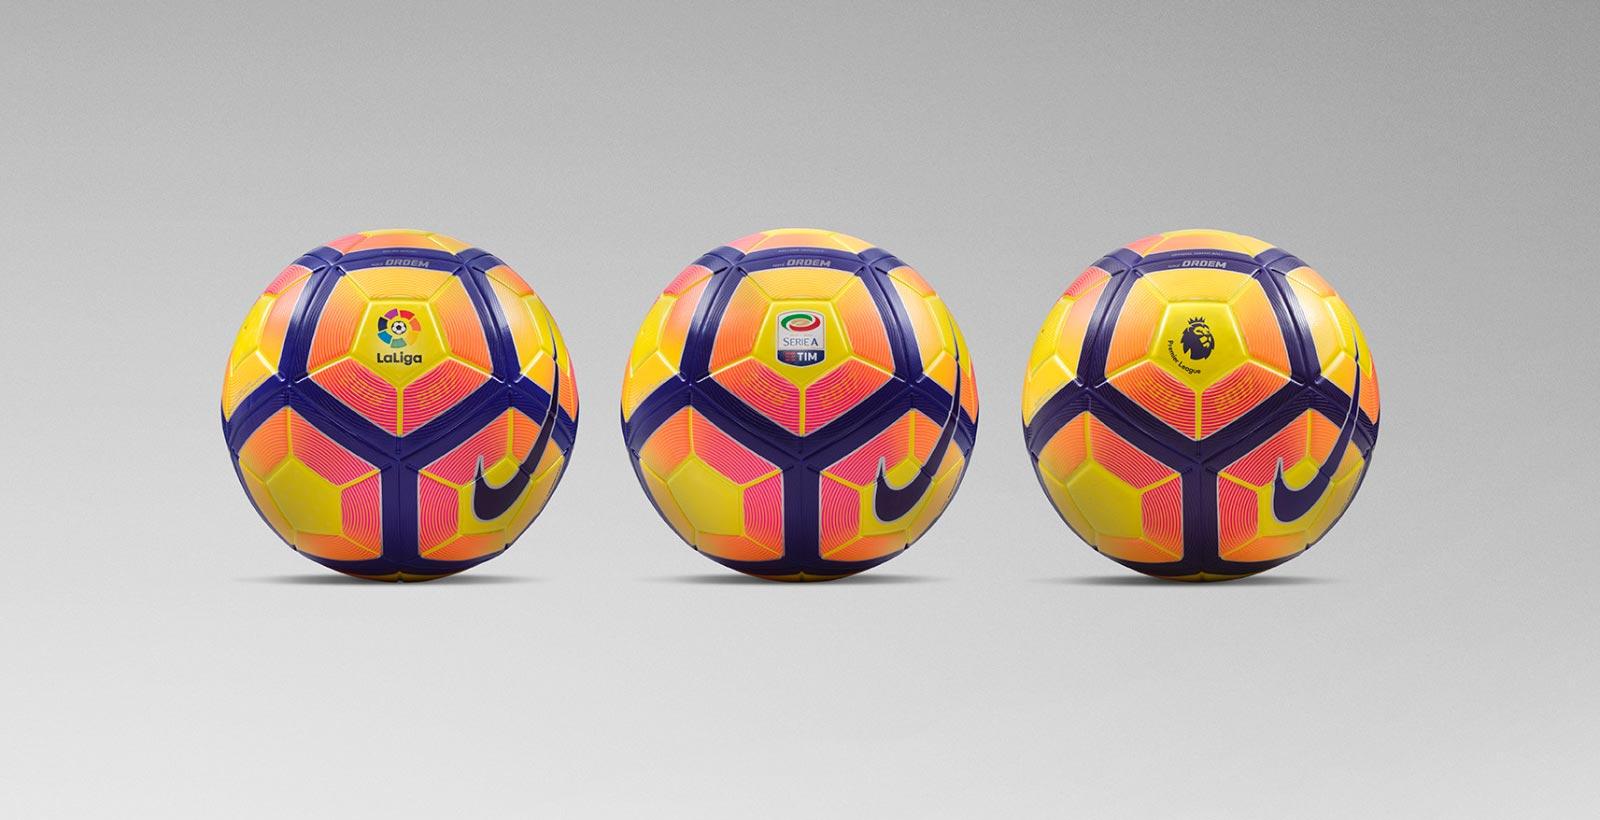 La Liga: Nike 2016-17 Premier League, La Liga And Serie A Winter